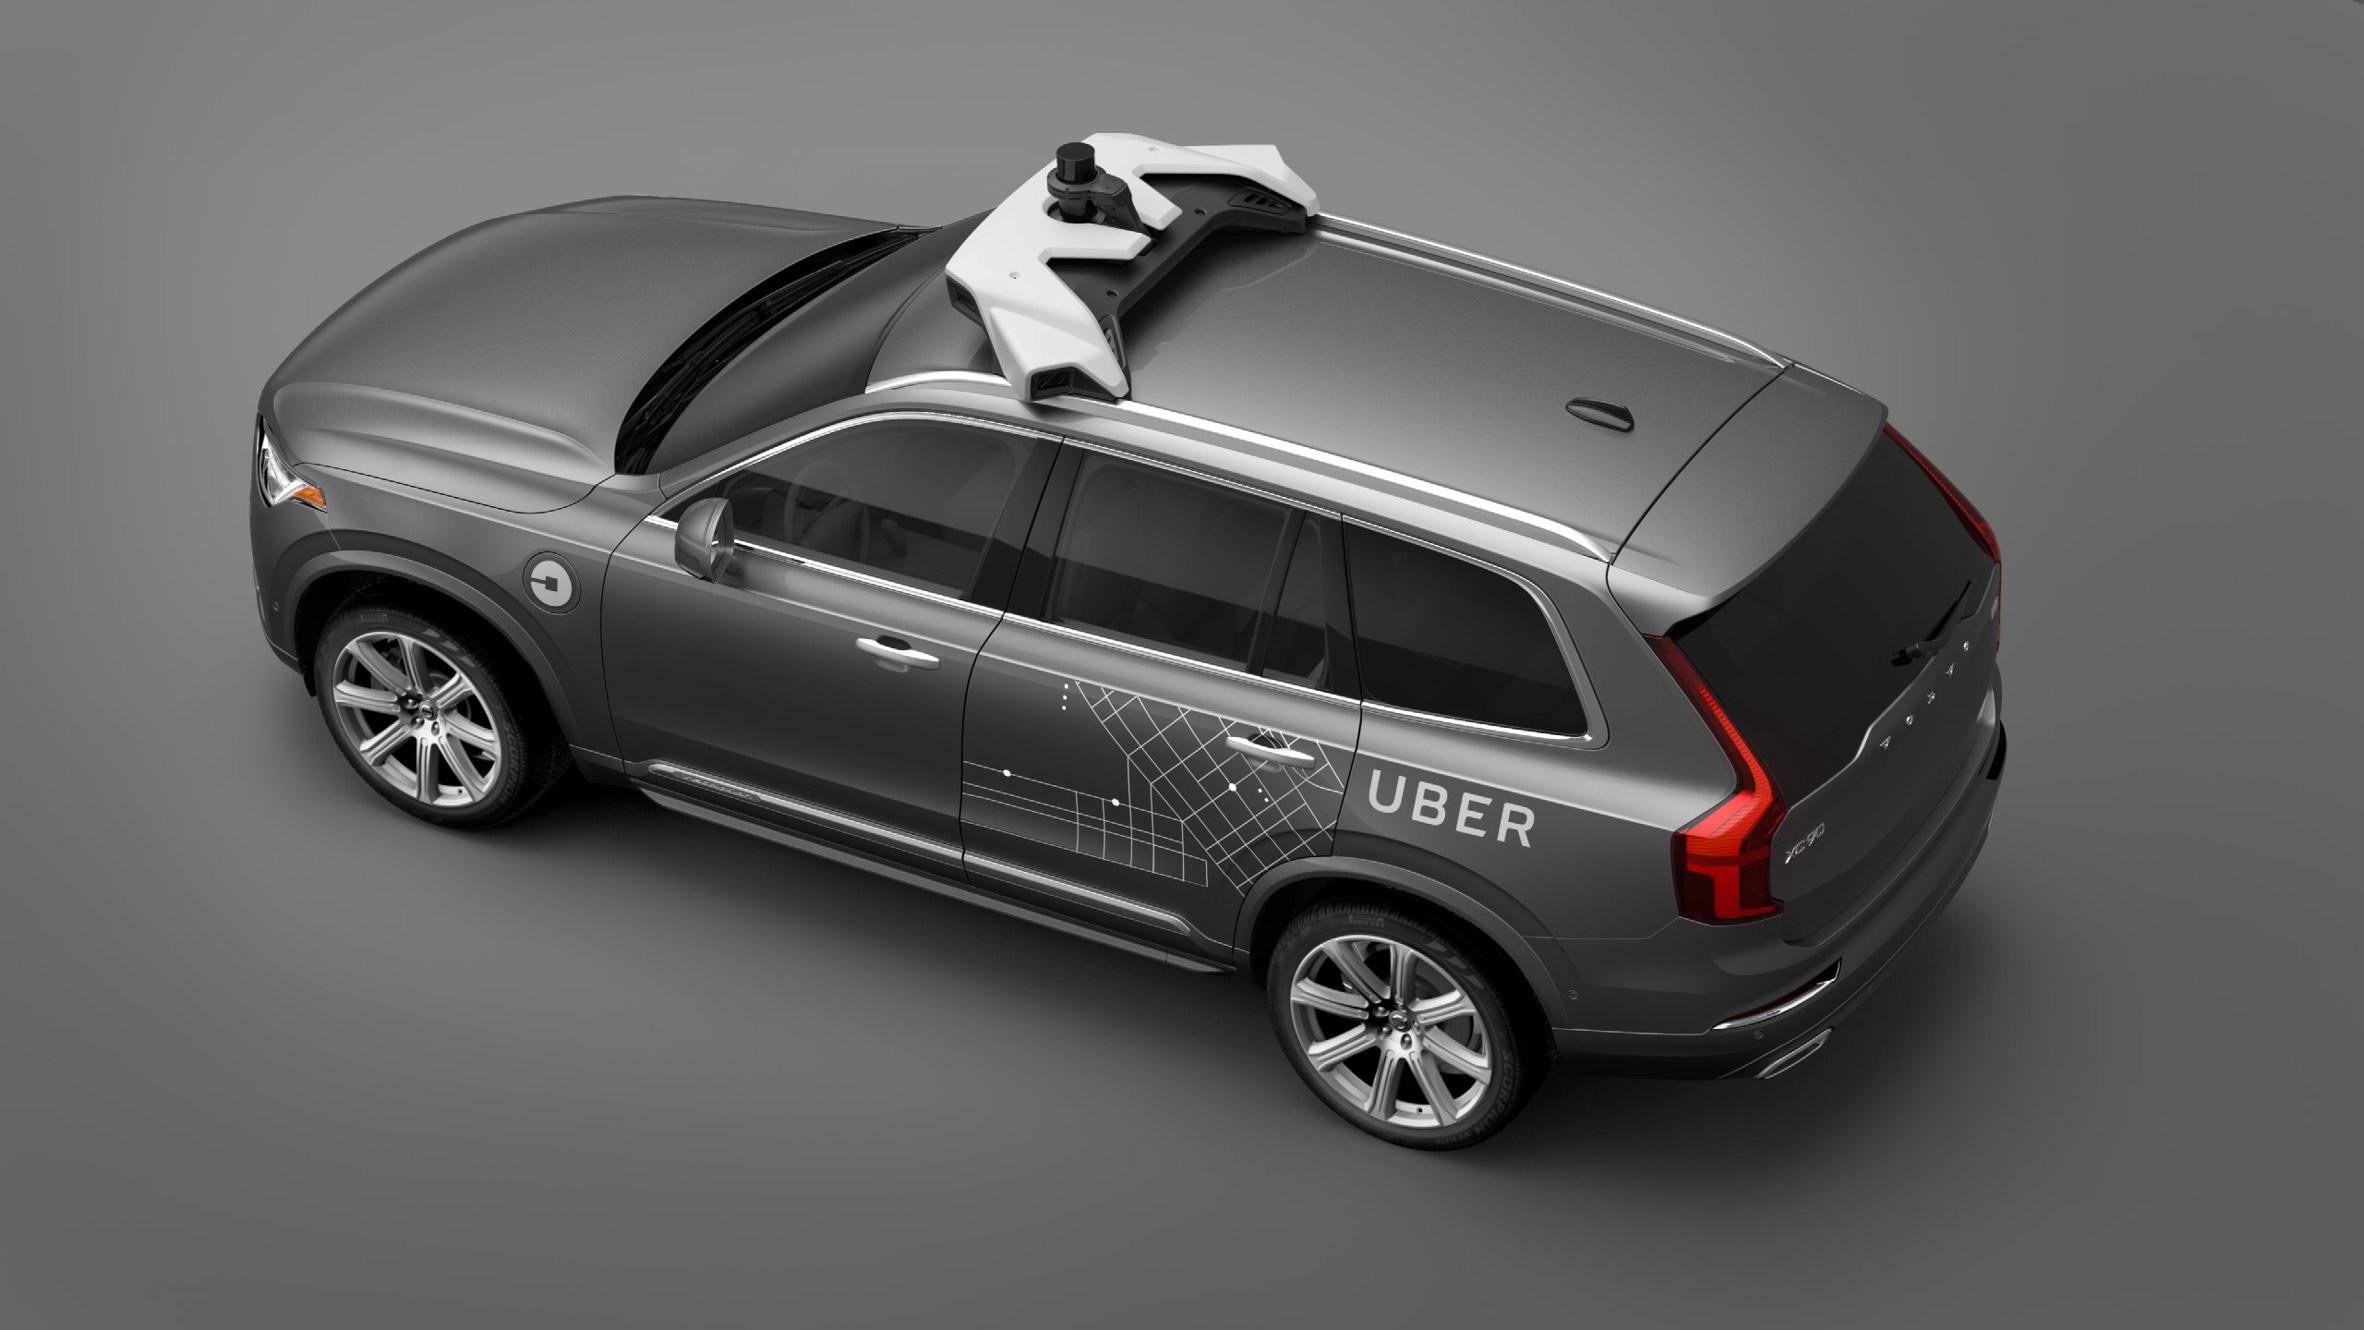 Design of car model - Uber Edges Towards Driverless Taxis With Daimler Partnership